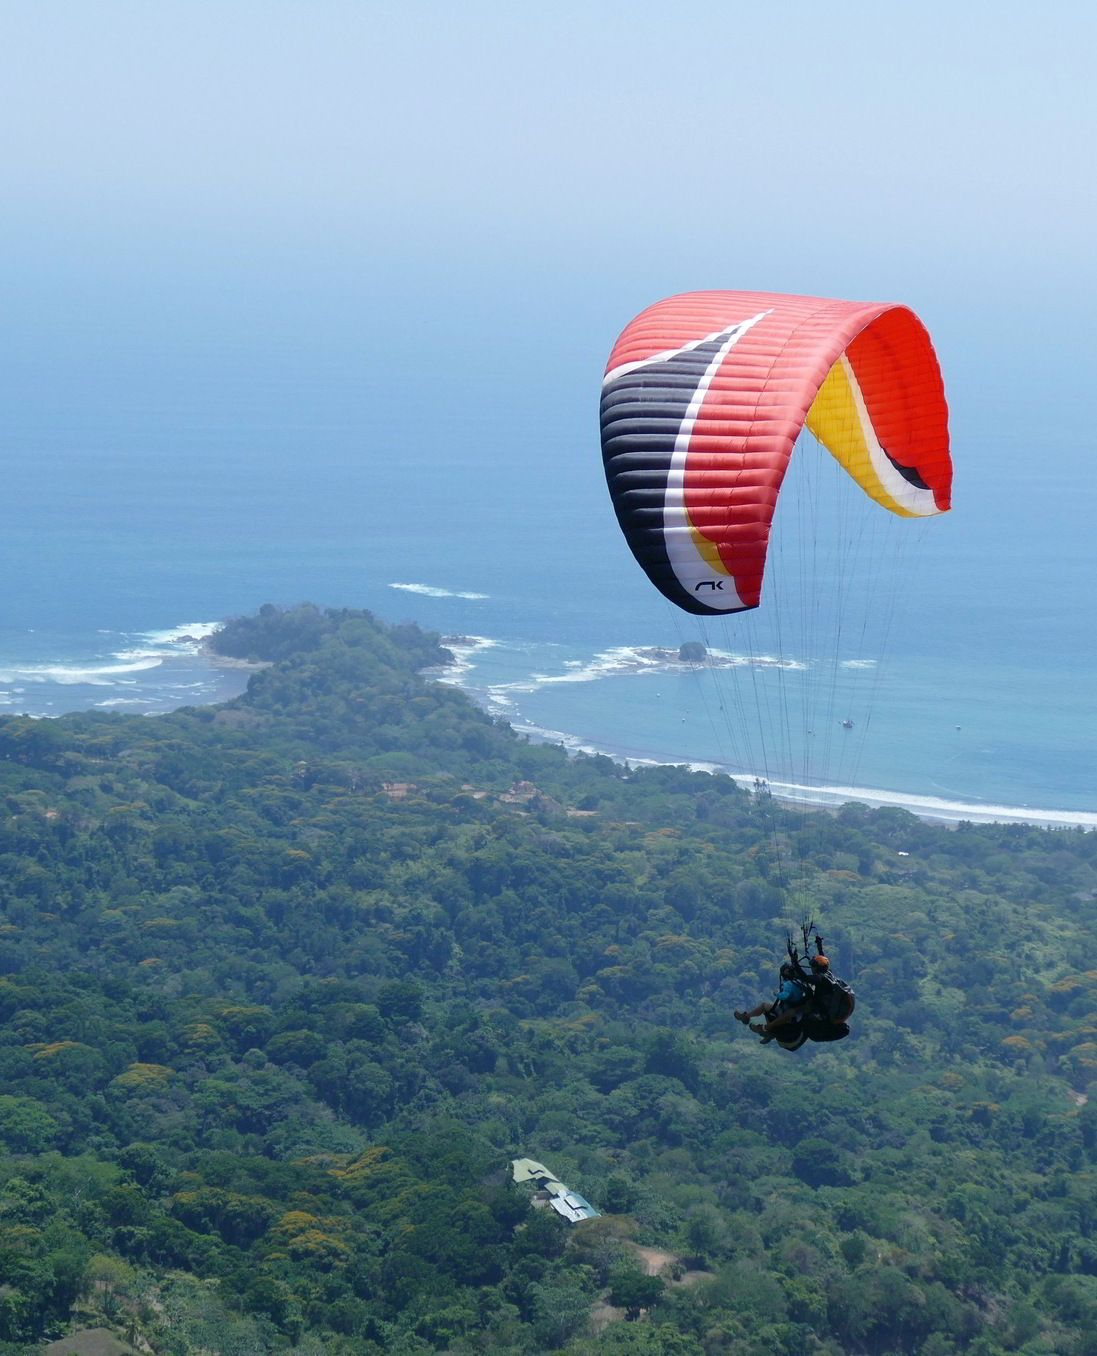 Aventura 2020, Costa Ballena y Península de Osa, Costa Rica, Amazing Costa Rica tours! Adventure in Costa Ballena and the Osa Penìnsula awaits